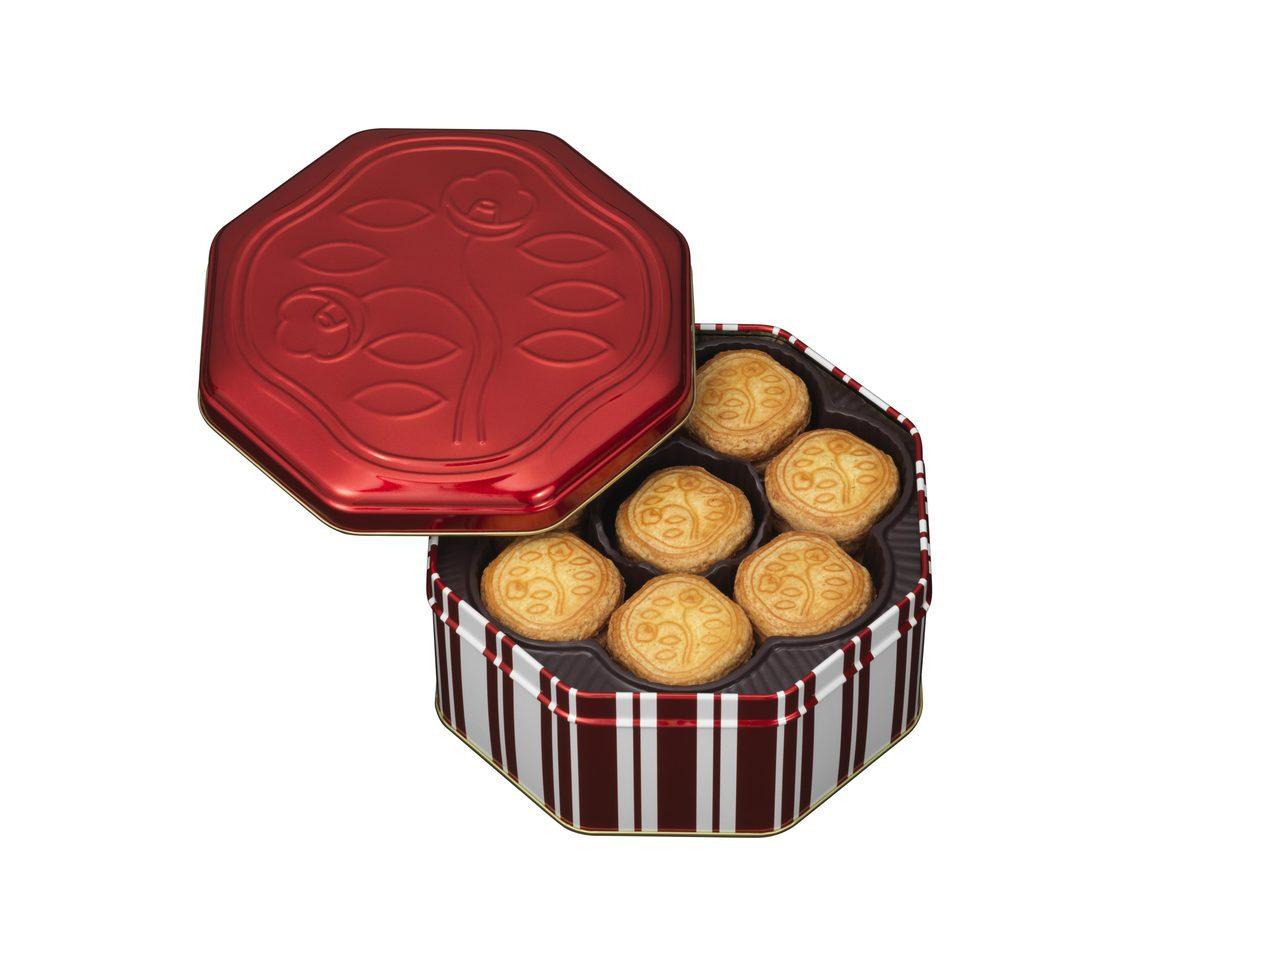 SHISEIDO PARLOUR花椿餅乾48入約1,450元。圖/SOGO提供